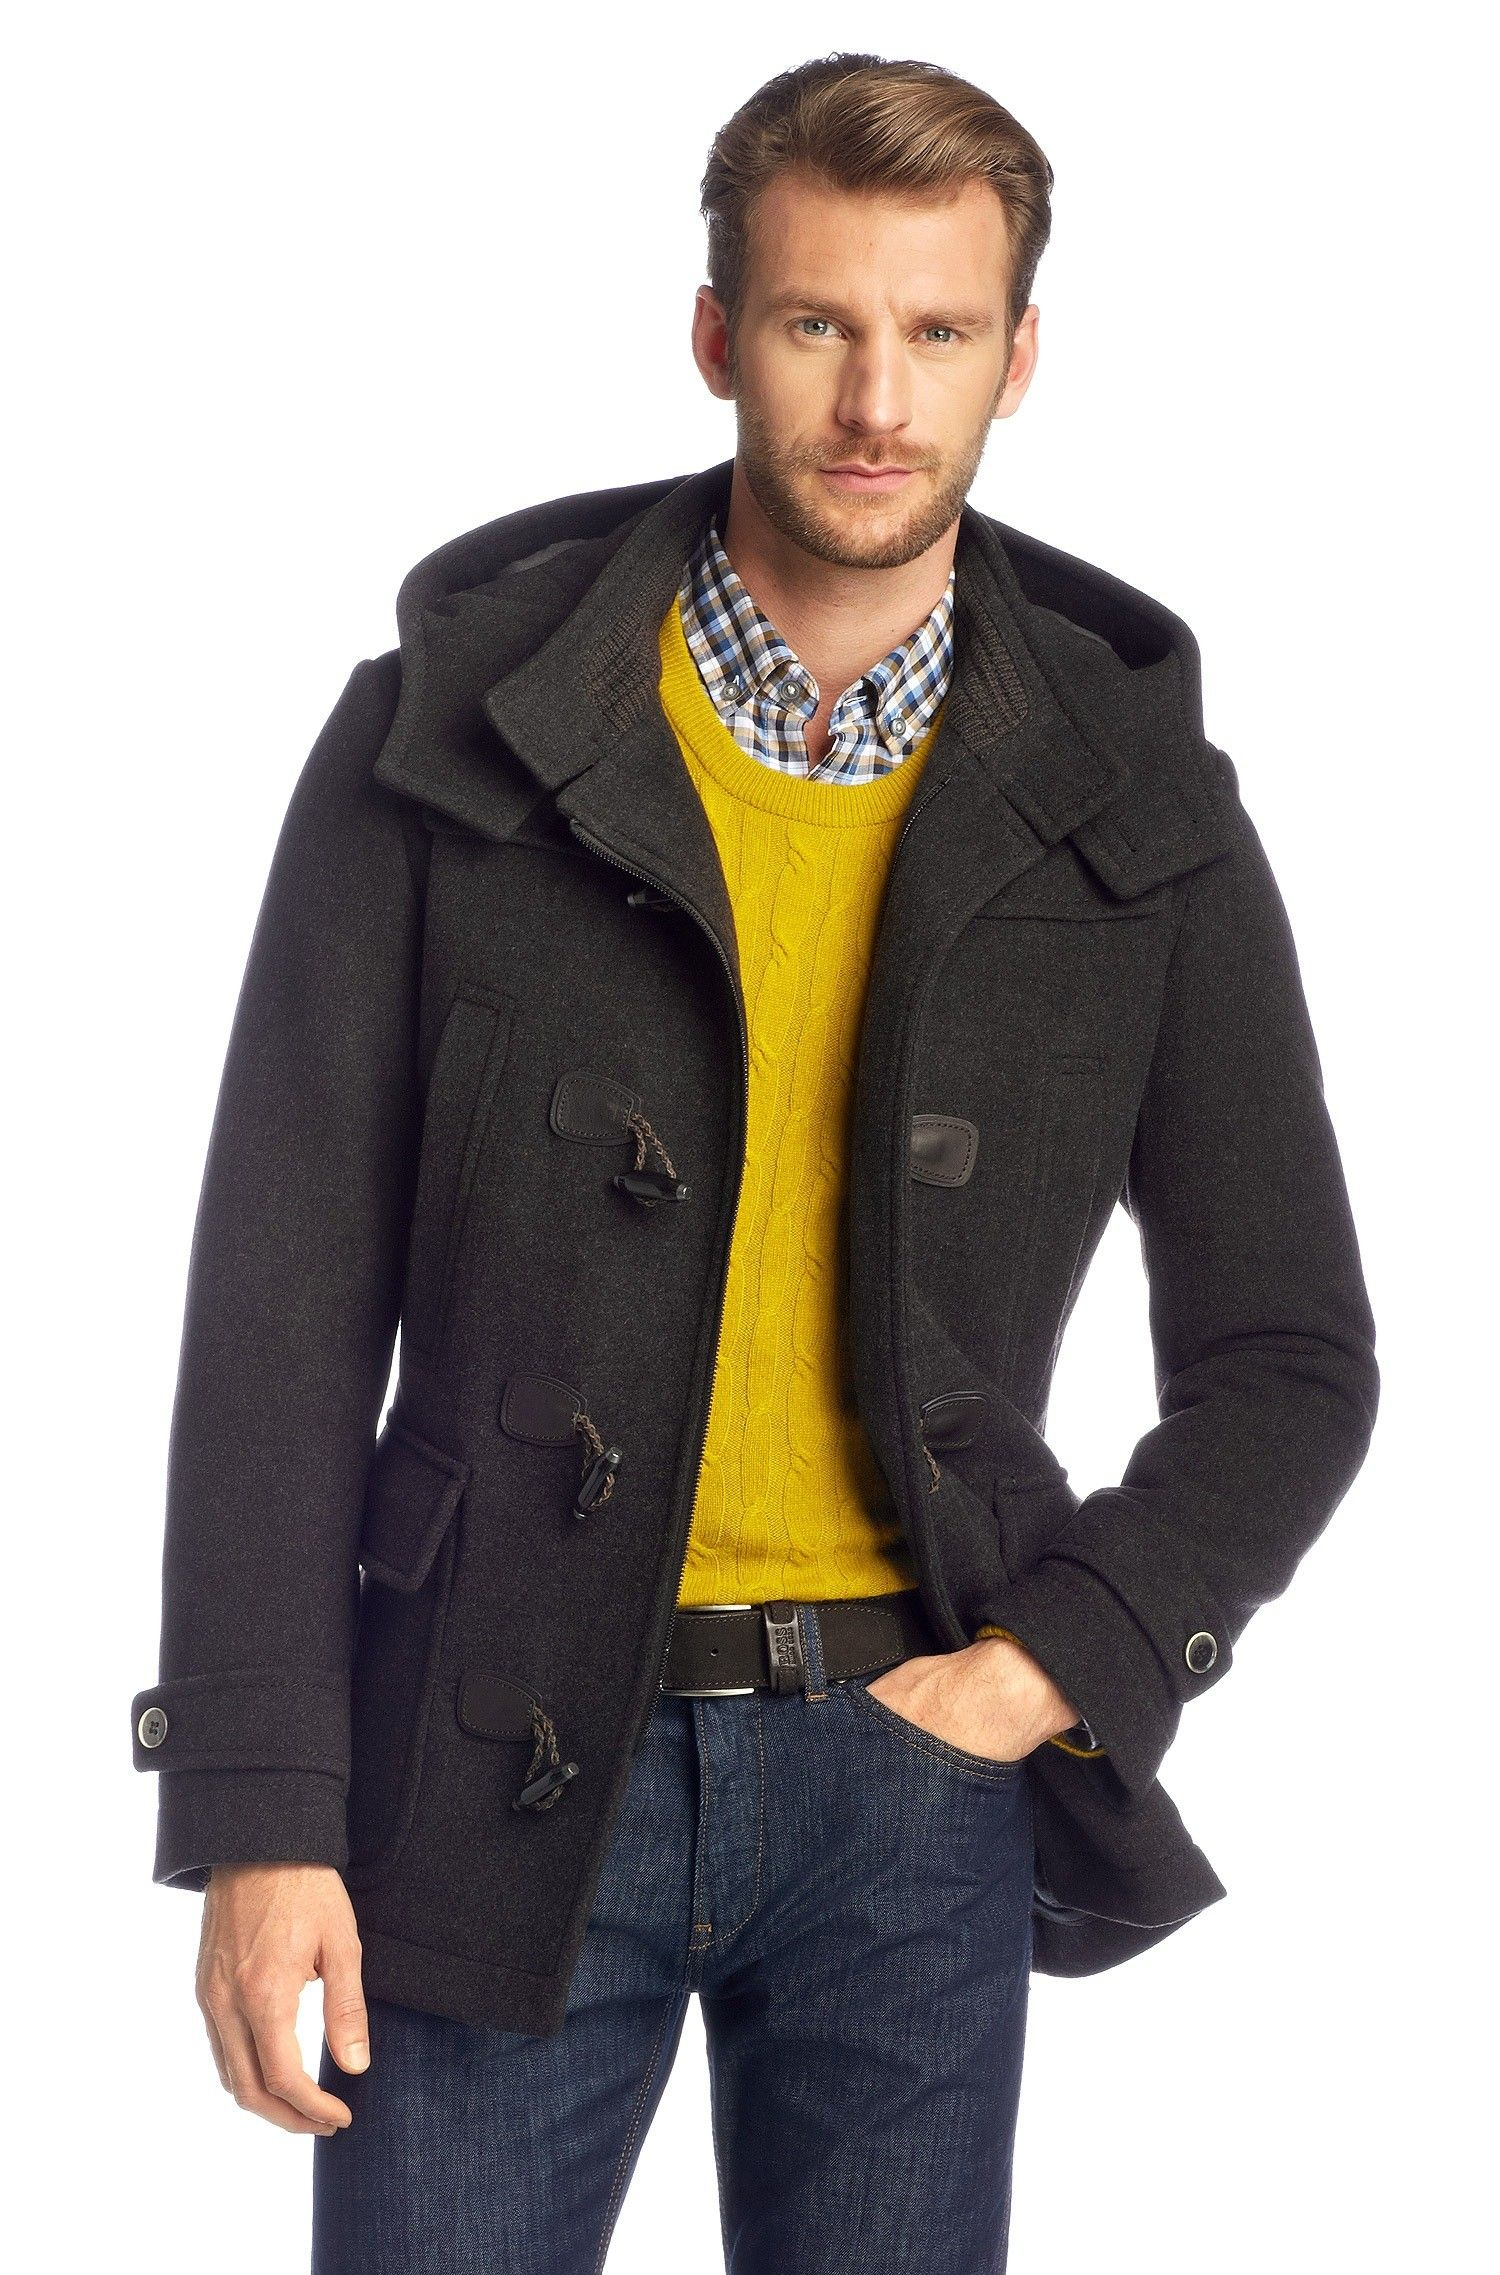 http://www.circle-fashion.com/sale/hugo-boss-capez-duffle-coat ...